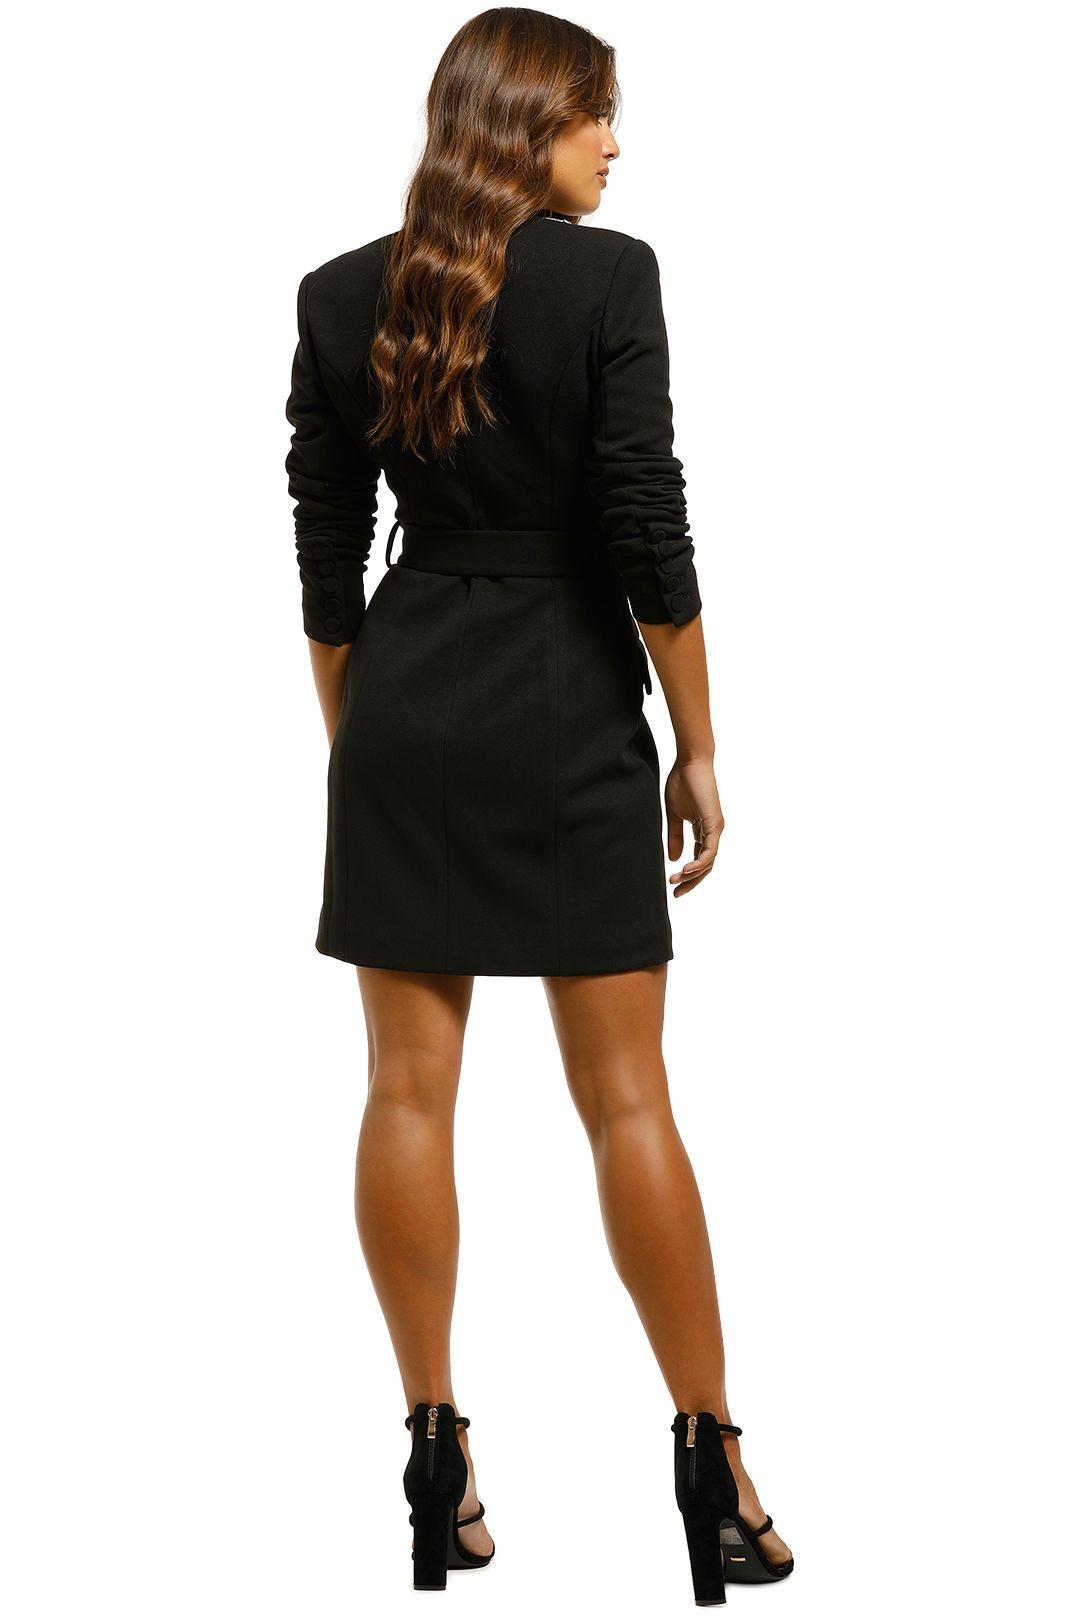 Misha-Helen-Blazer-Dress-Black-Back